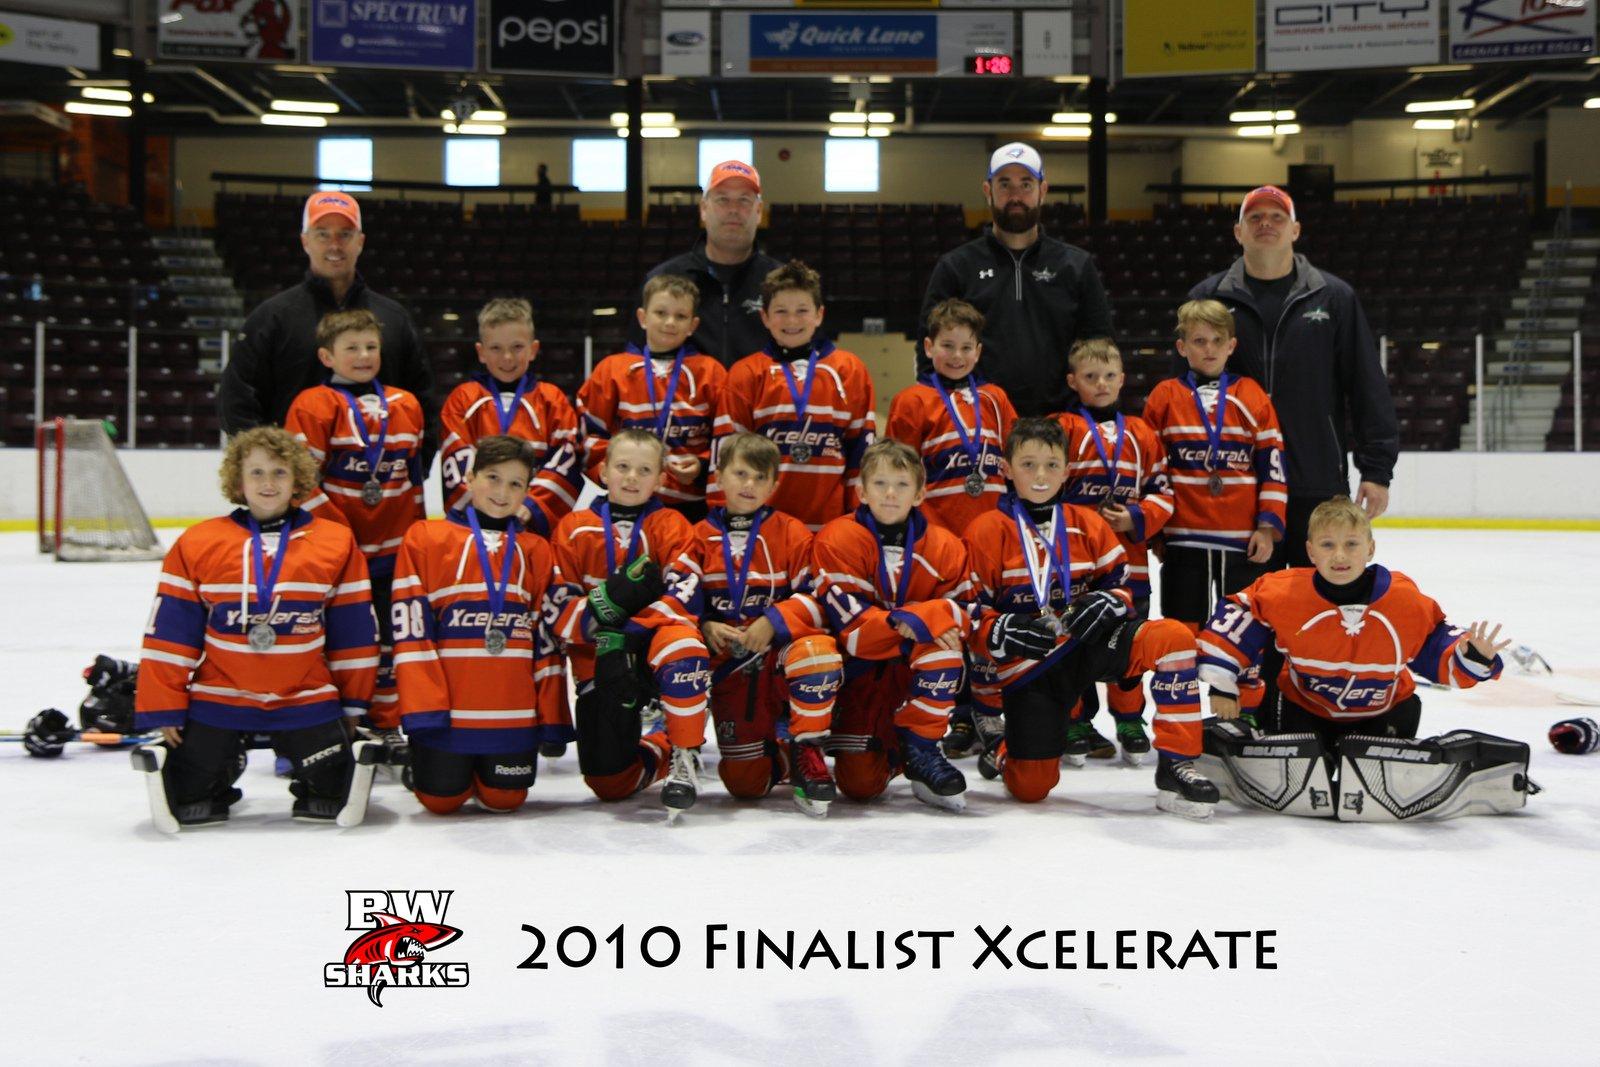 2010-Finalists-Xcelerate-SilverPeak-Studios-Canada-Sarnia-Bluewater-Sharks-Tournament-001